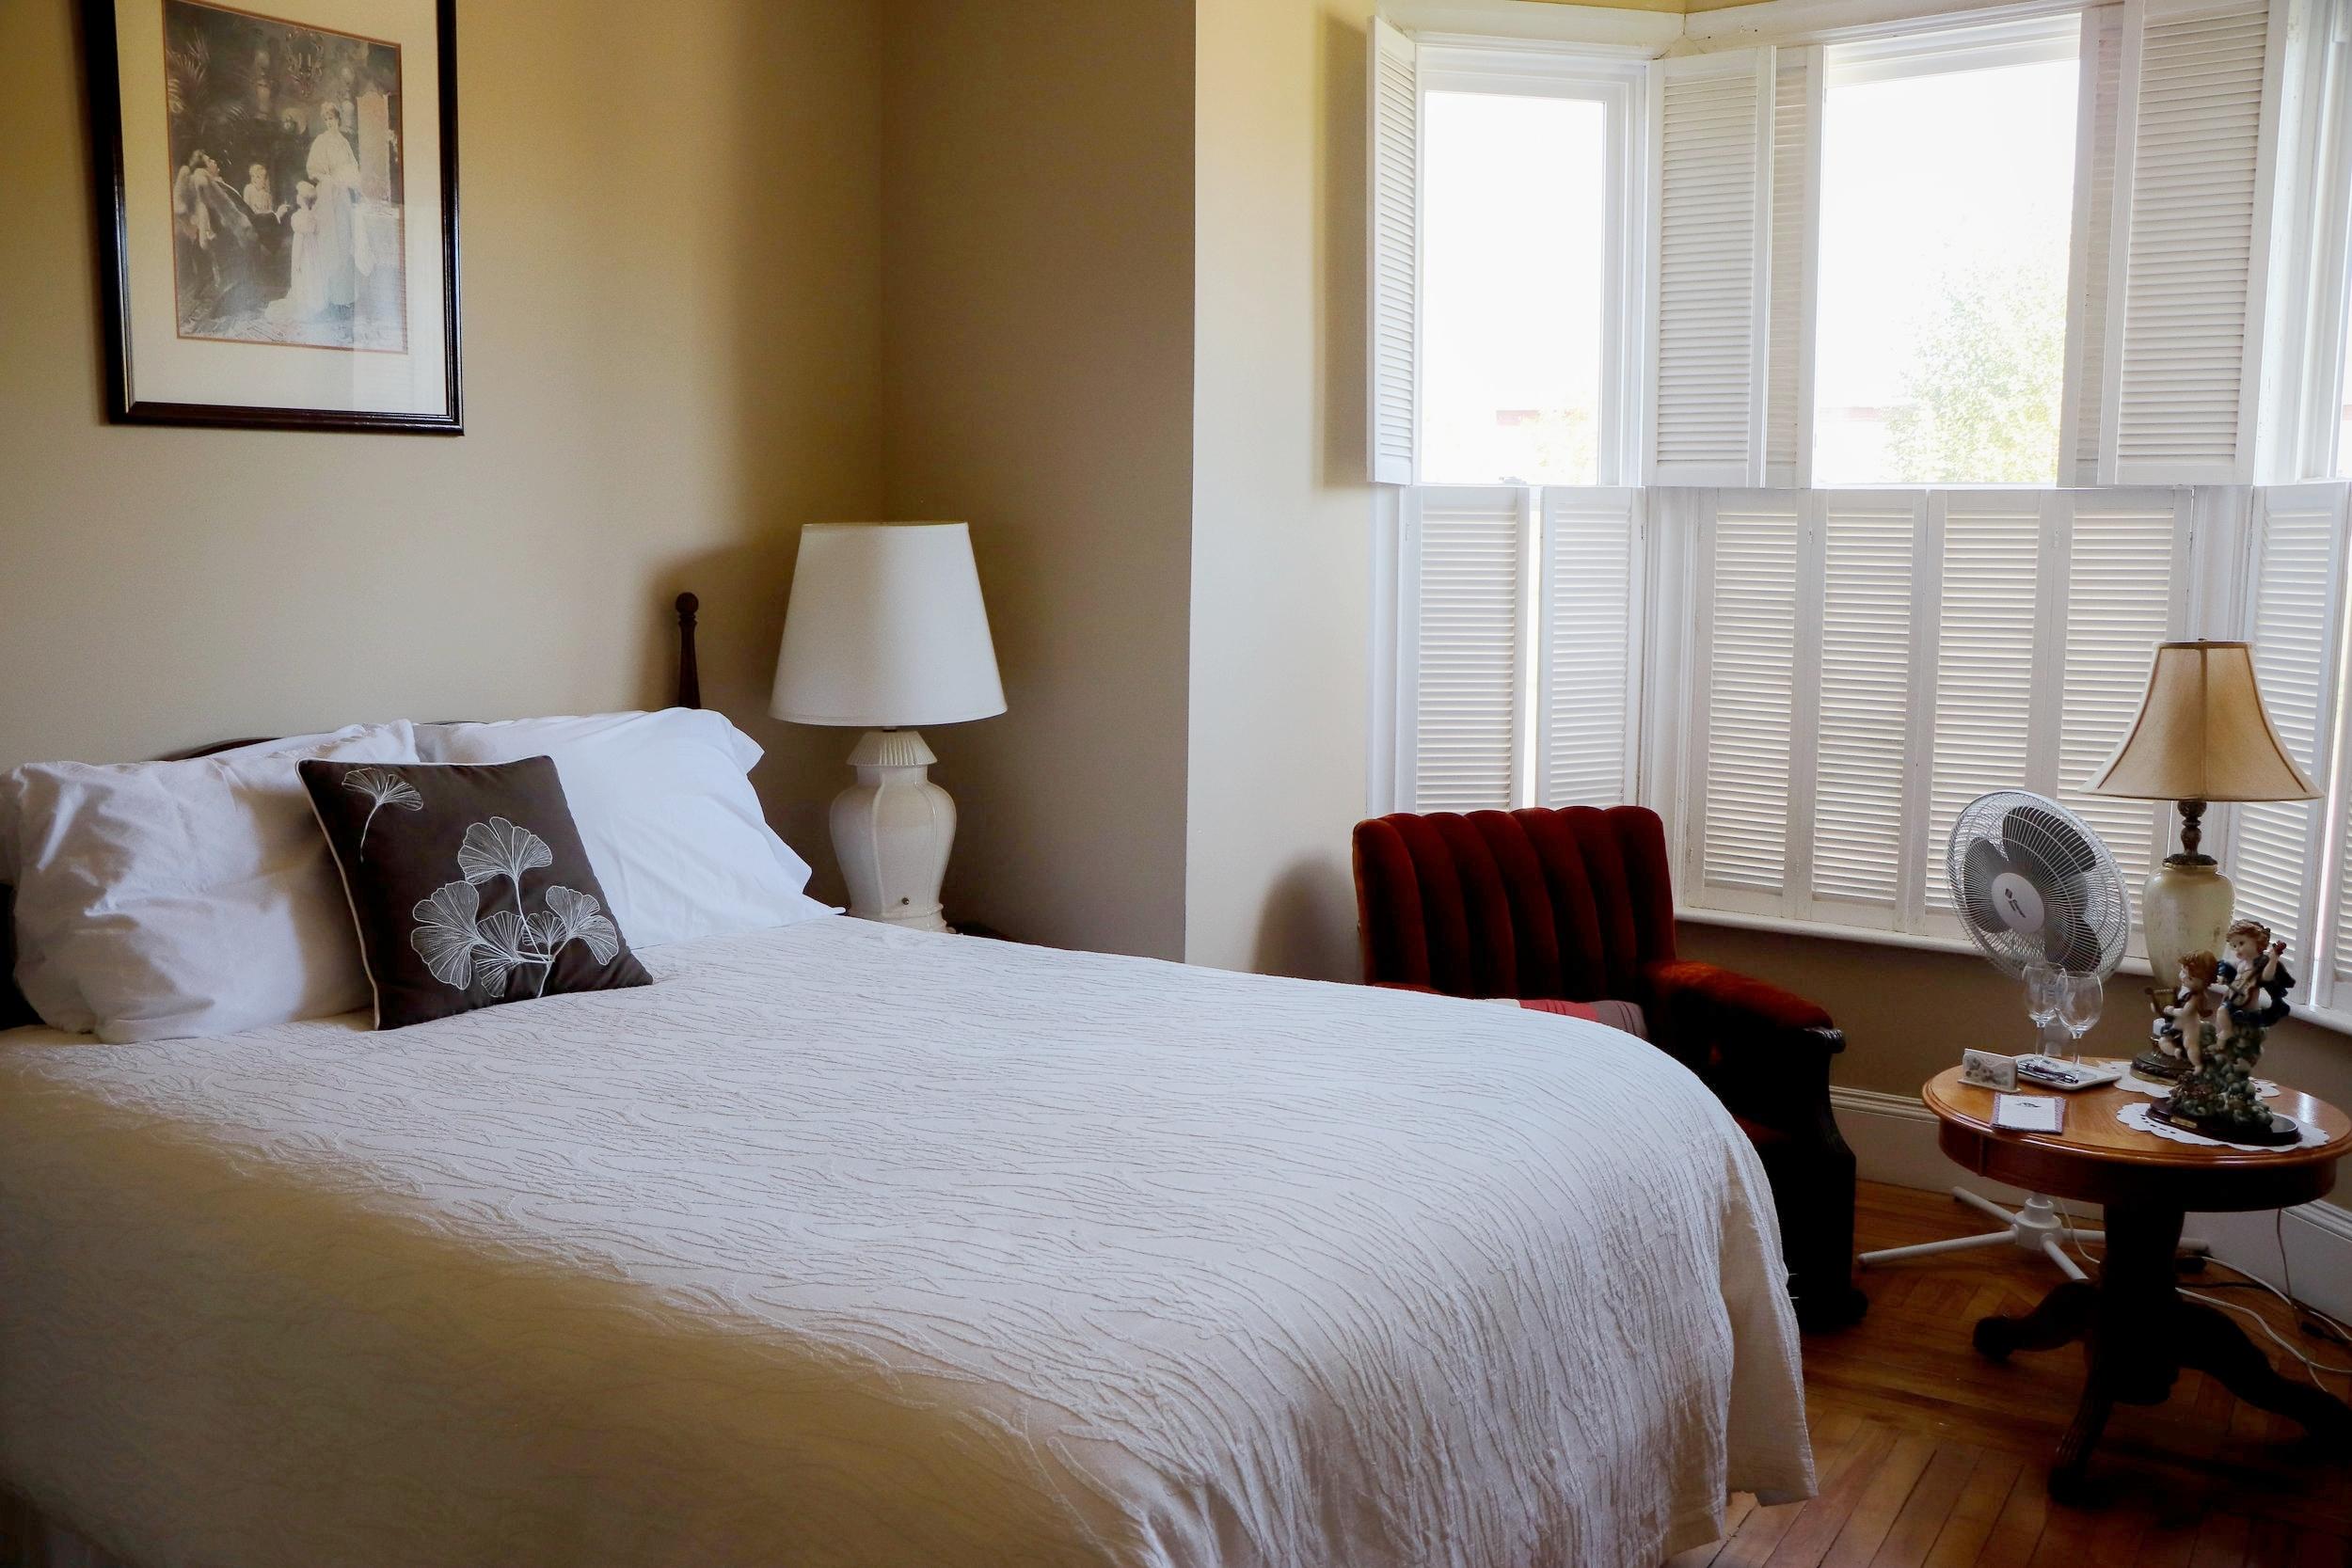 101 North Lake Room - Price $172.50/Night